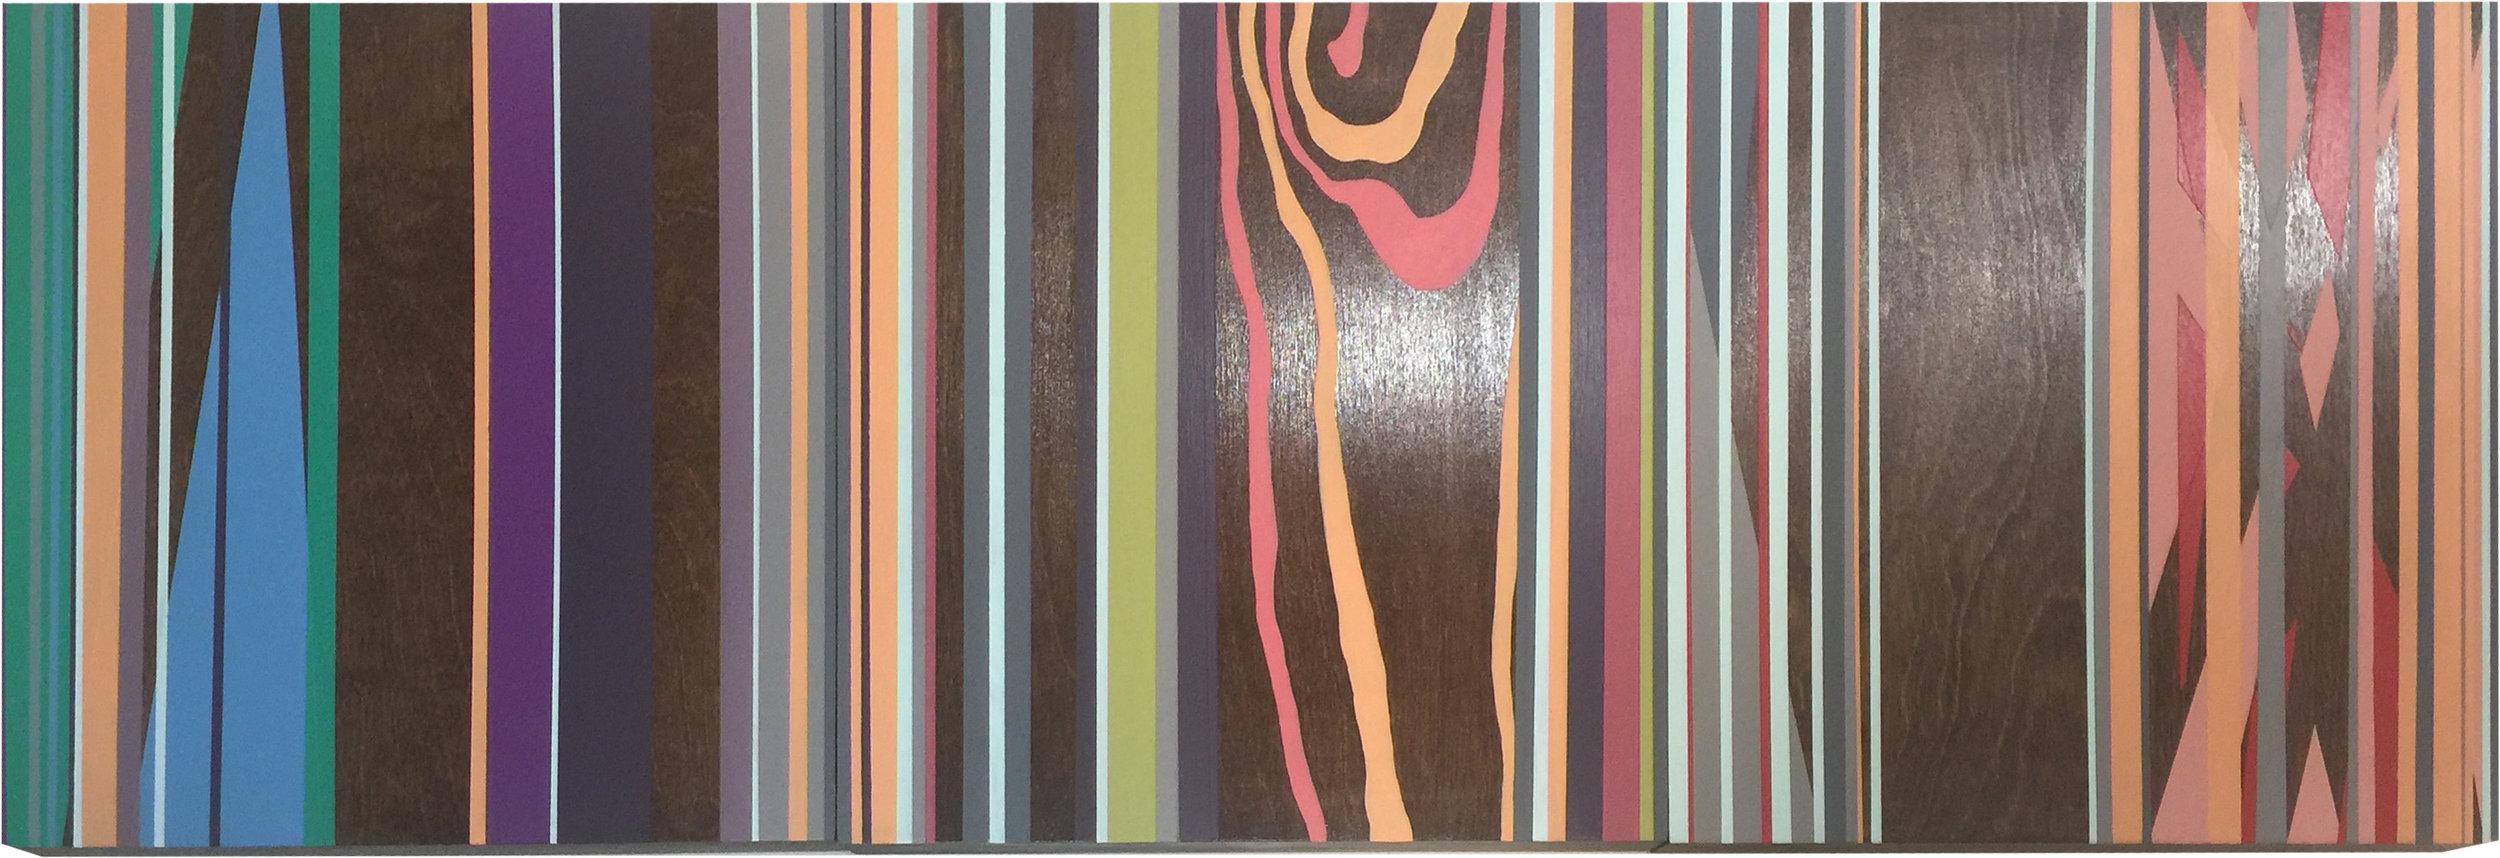 """Fluid Resonance 2"",acrylic on walnut,12x36"